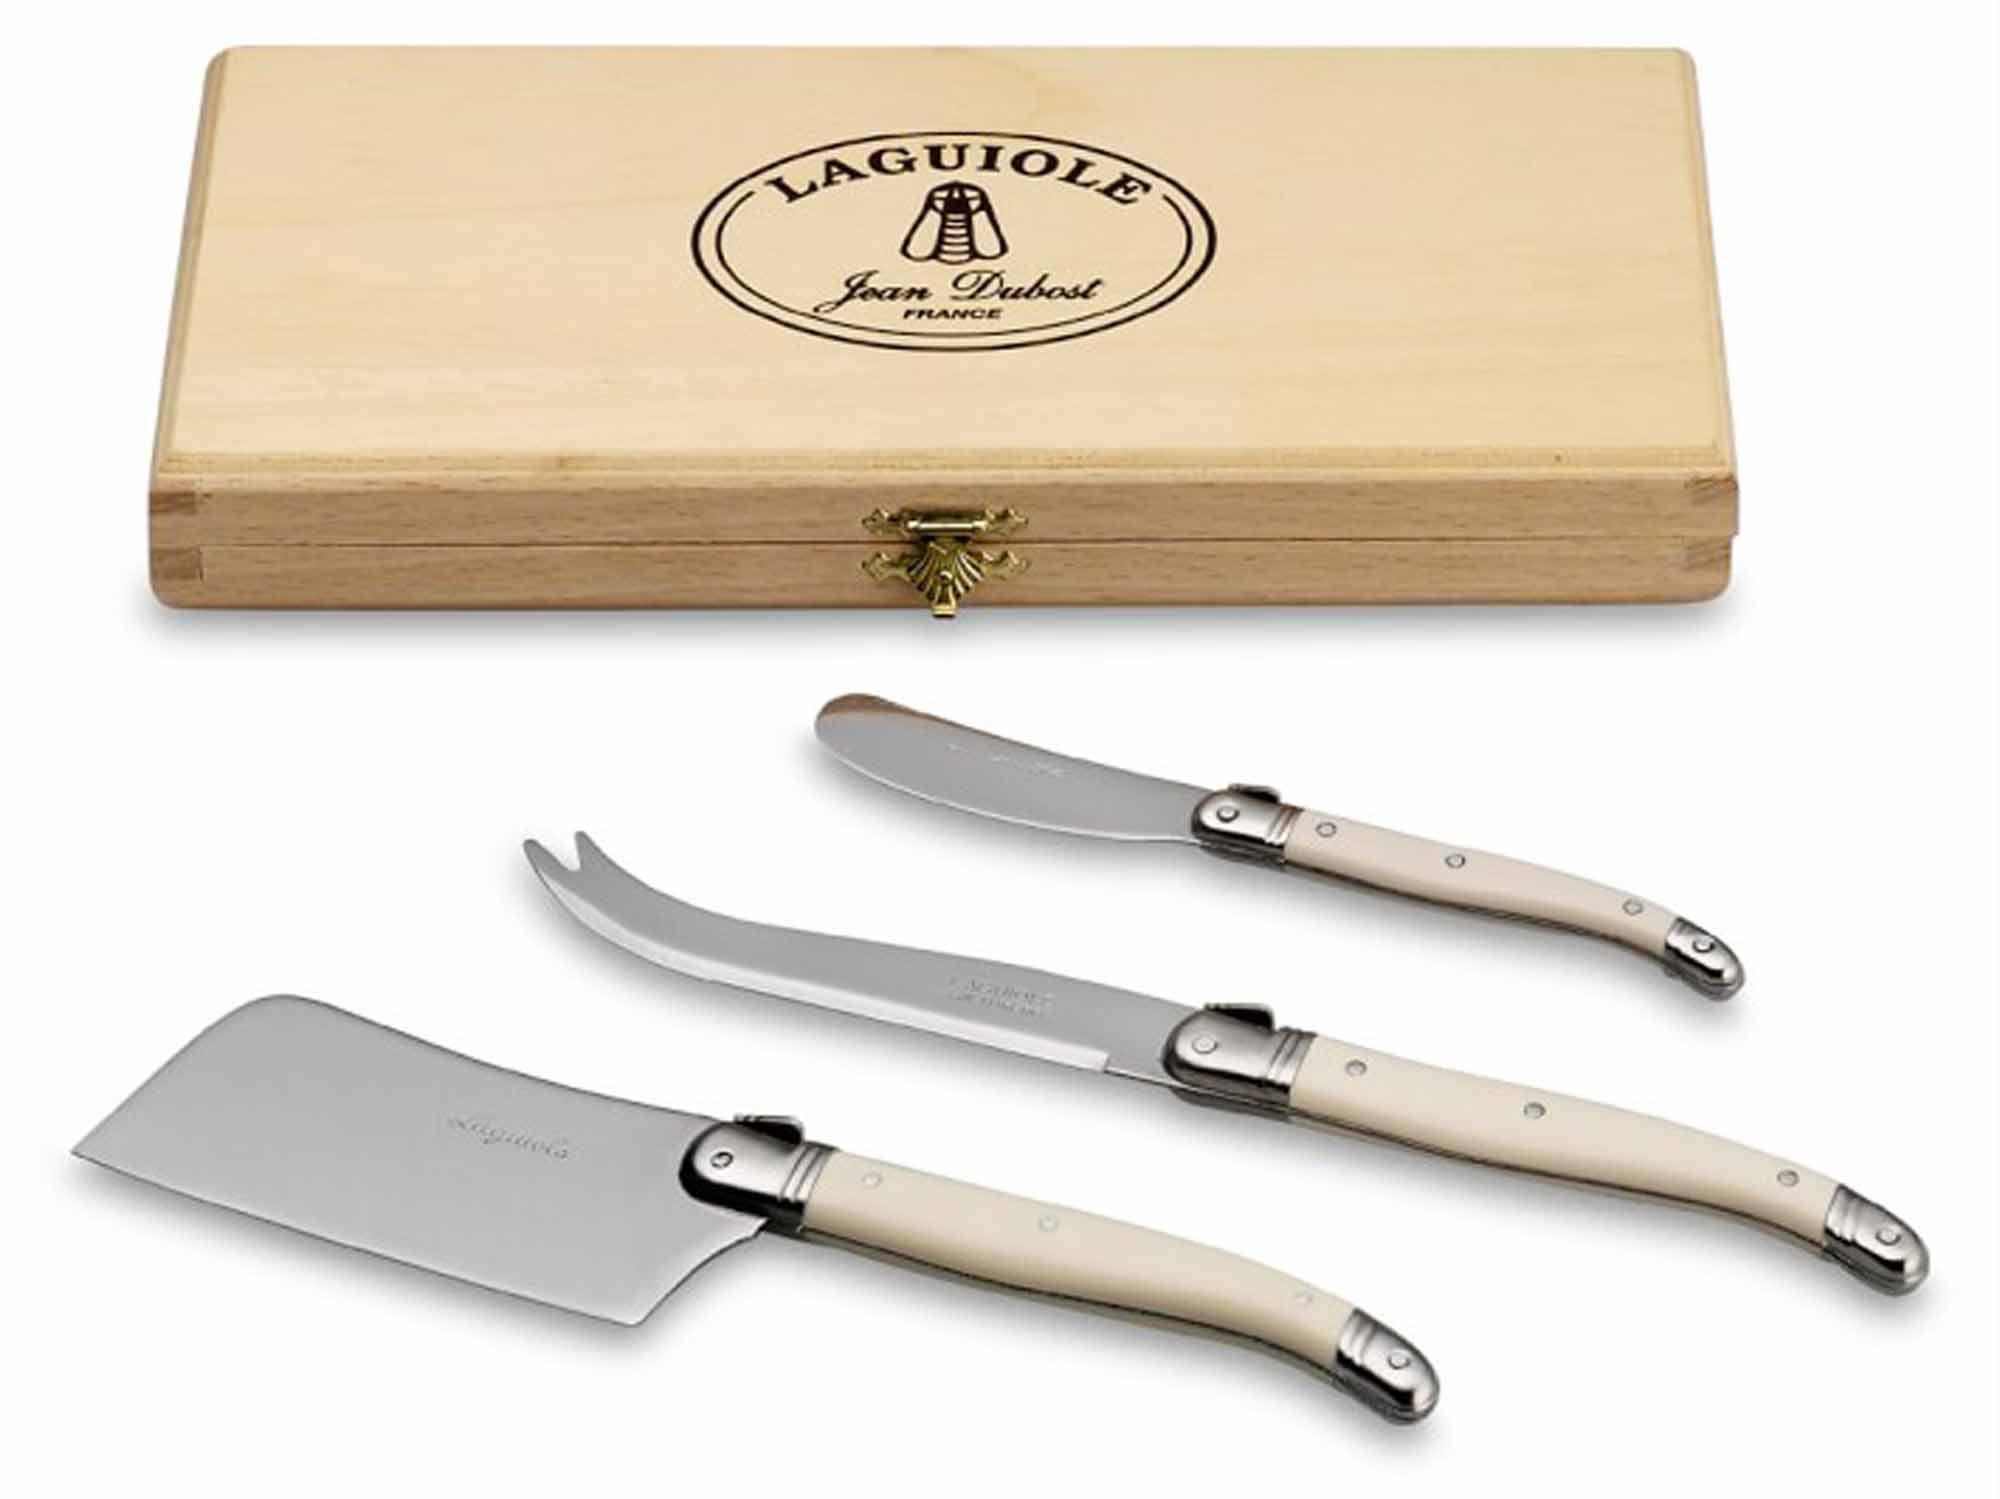 Laguiole cheese knife set